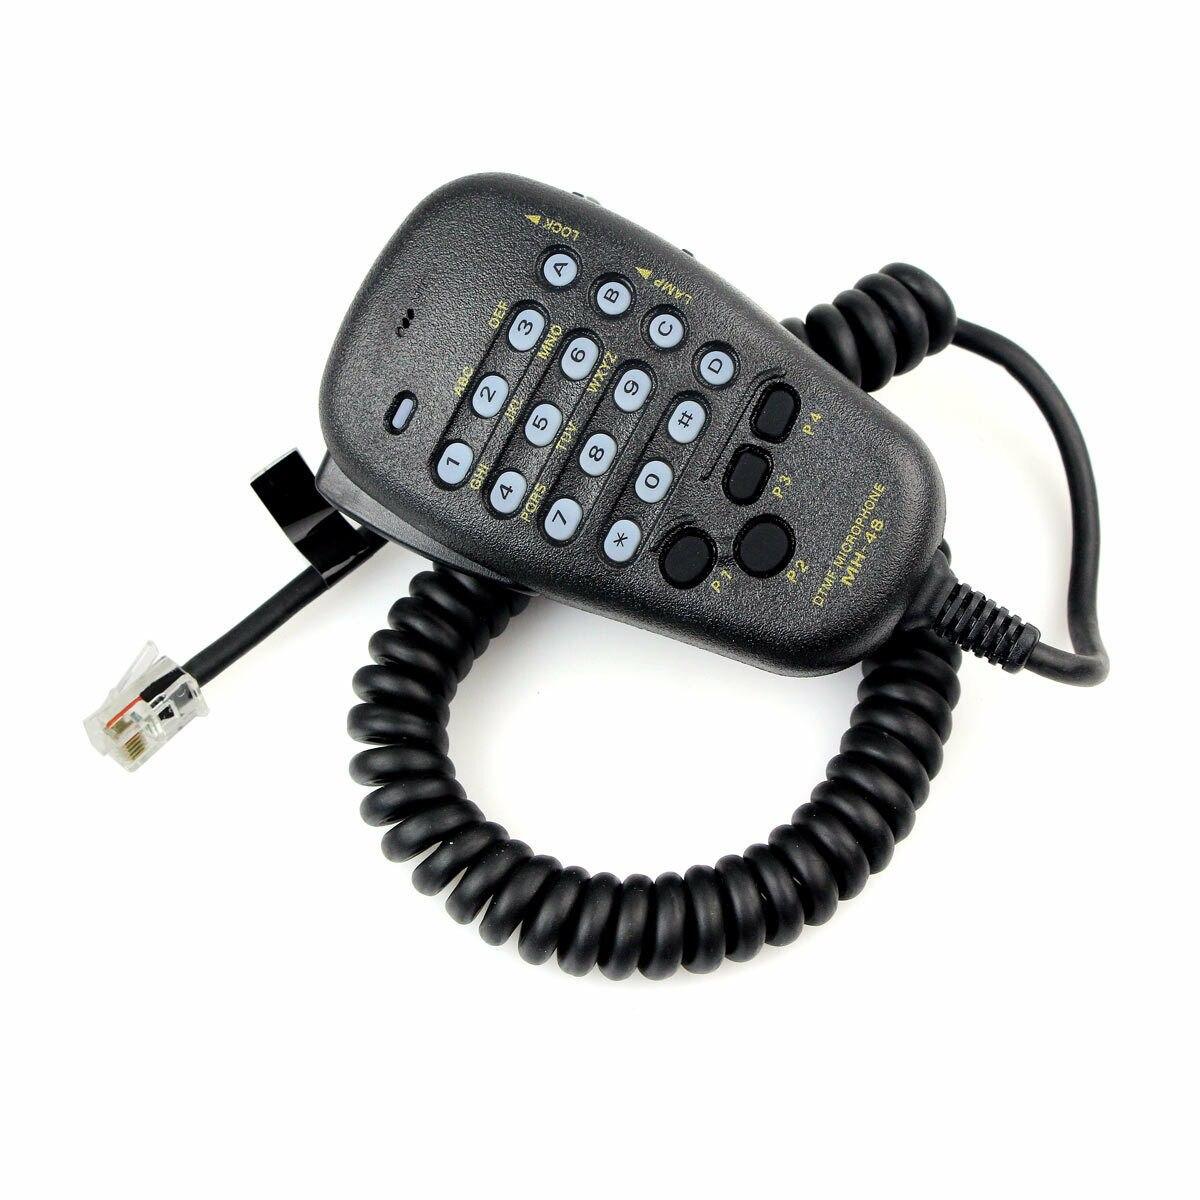 for FT-8800R FT-8900R FT-7900R FT-1807 FT-7800R FT-2900R FT-1900R DTMF Speaker For YAESU MH-48 MH-48A6J DTMF Speaker Microphone